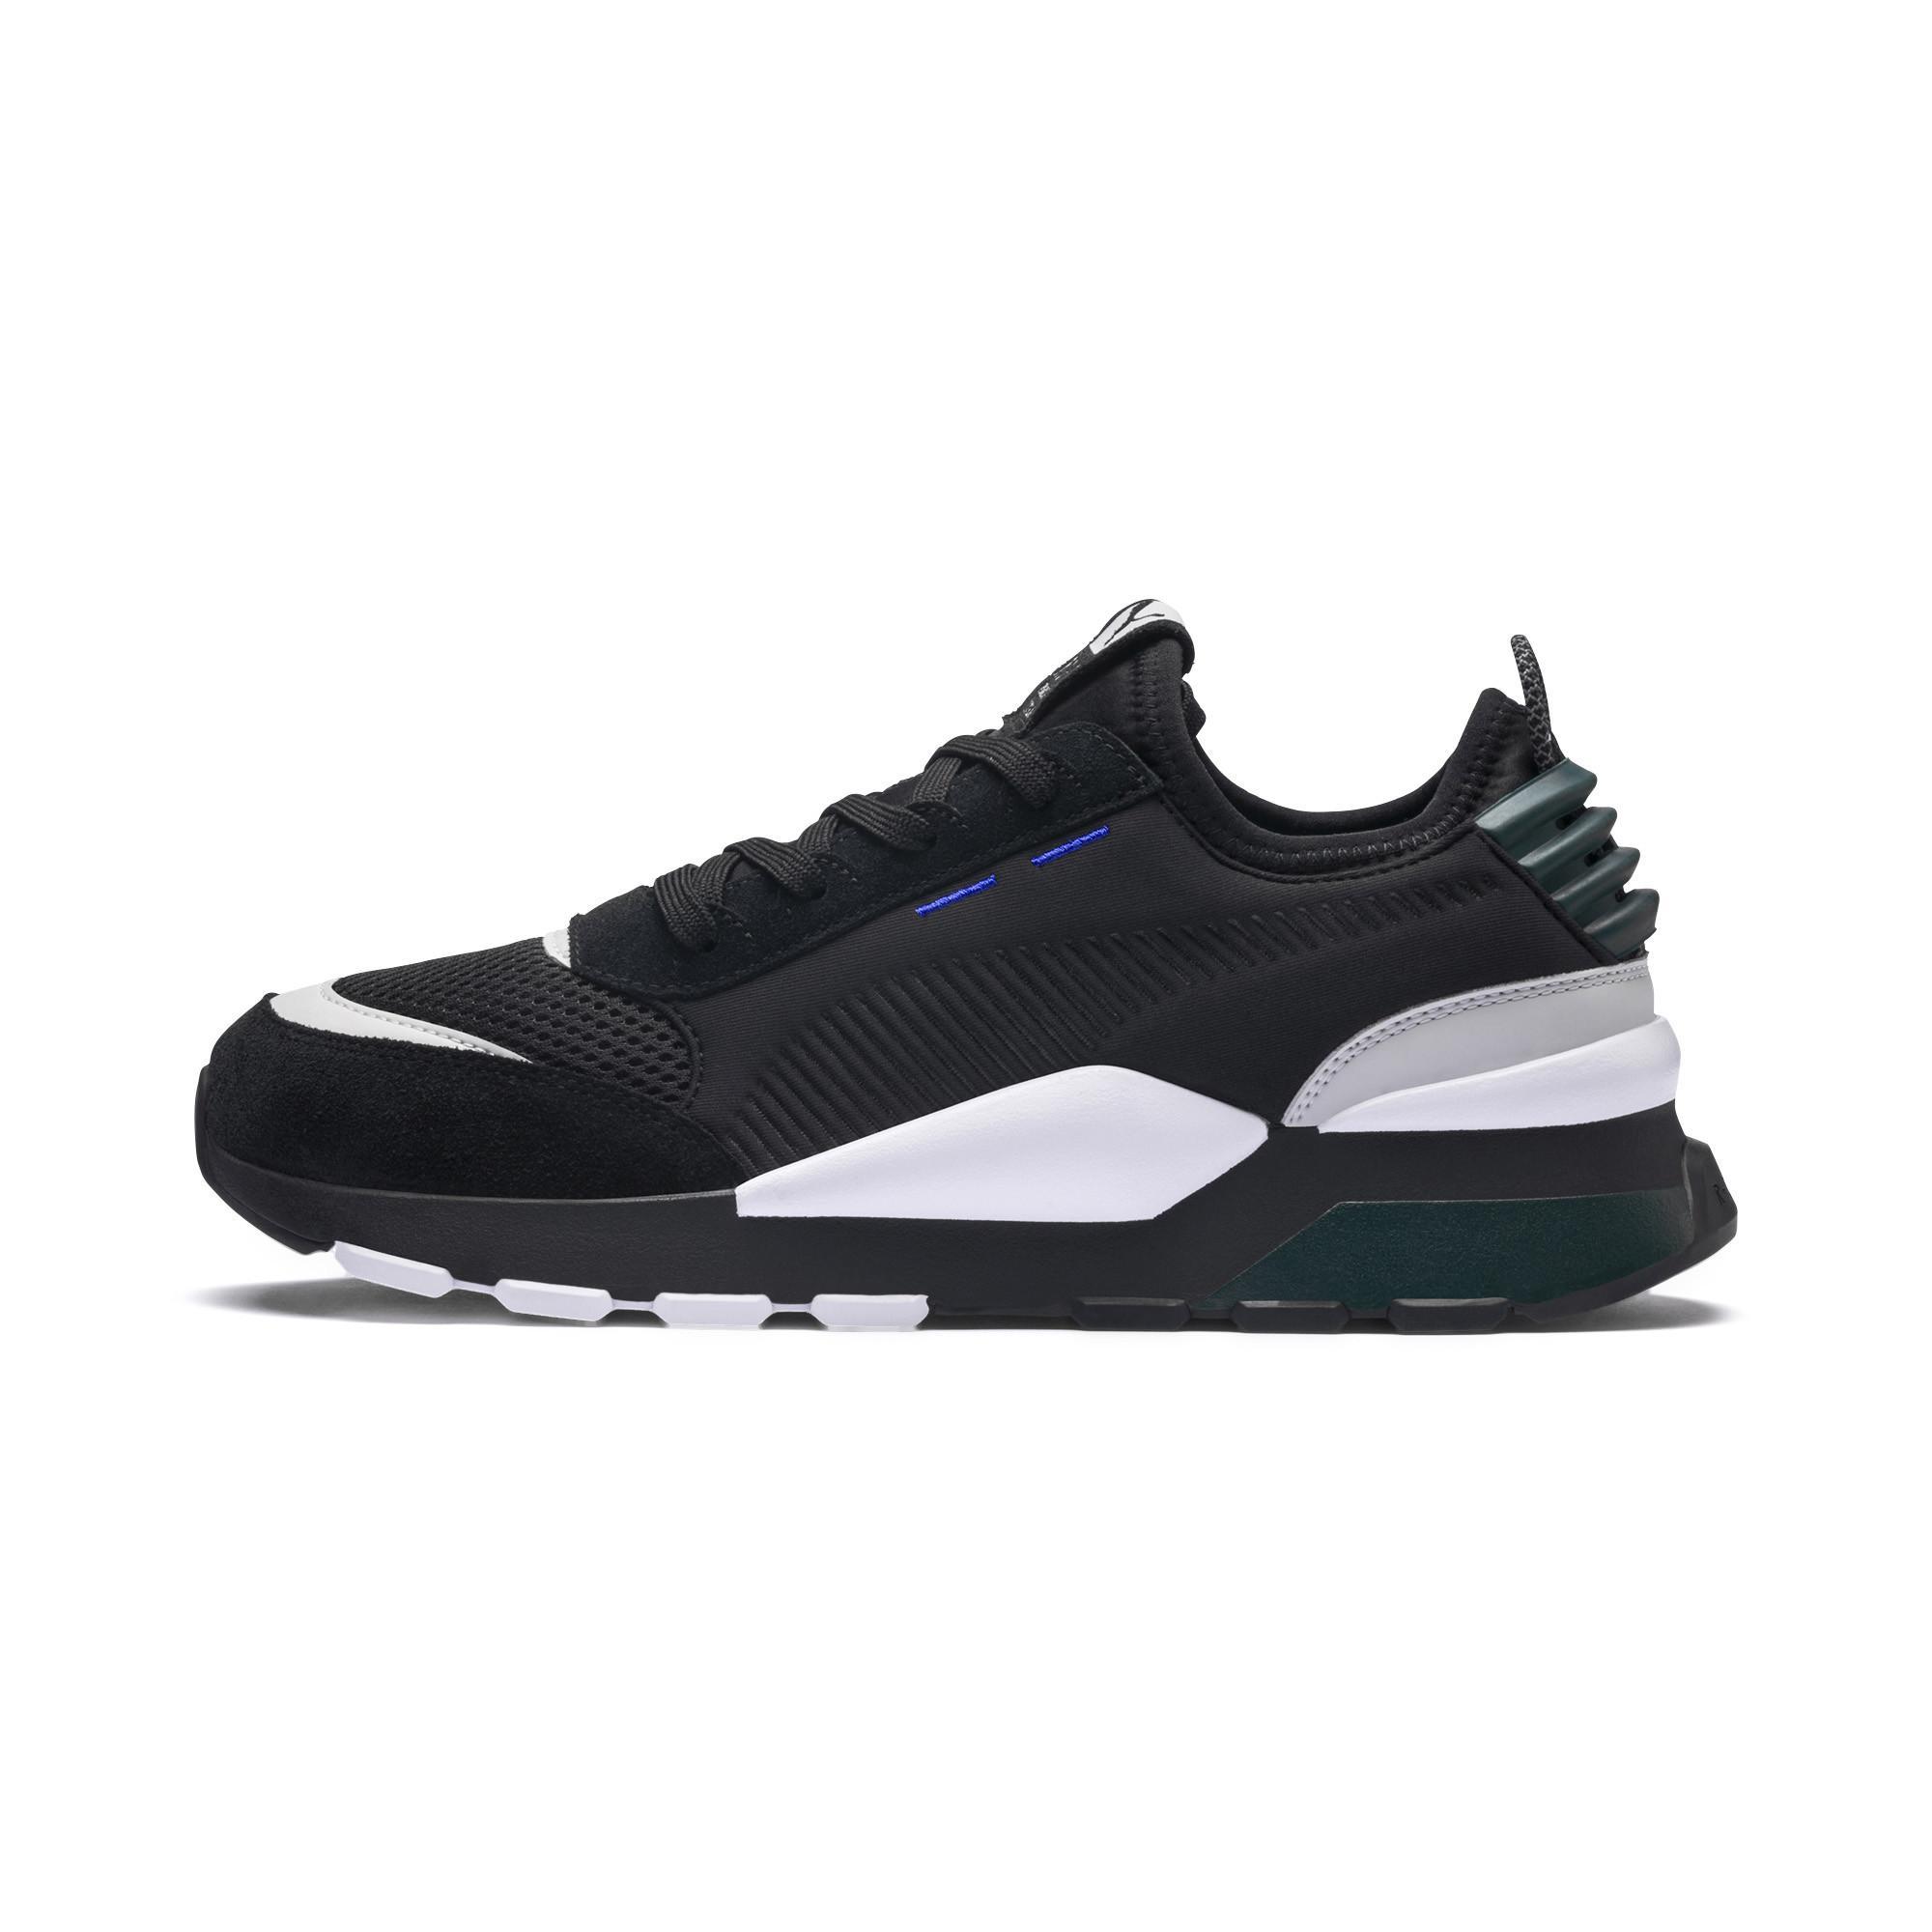 17214051915 Lyst - PUMA Rs-o Winter Inj Toys Men s Sneakers in Black for Men ...